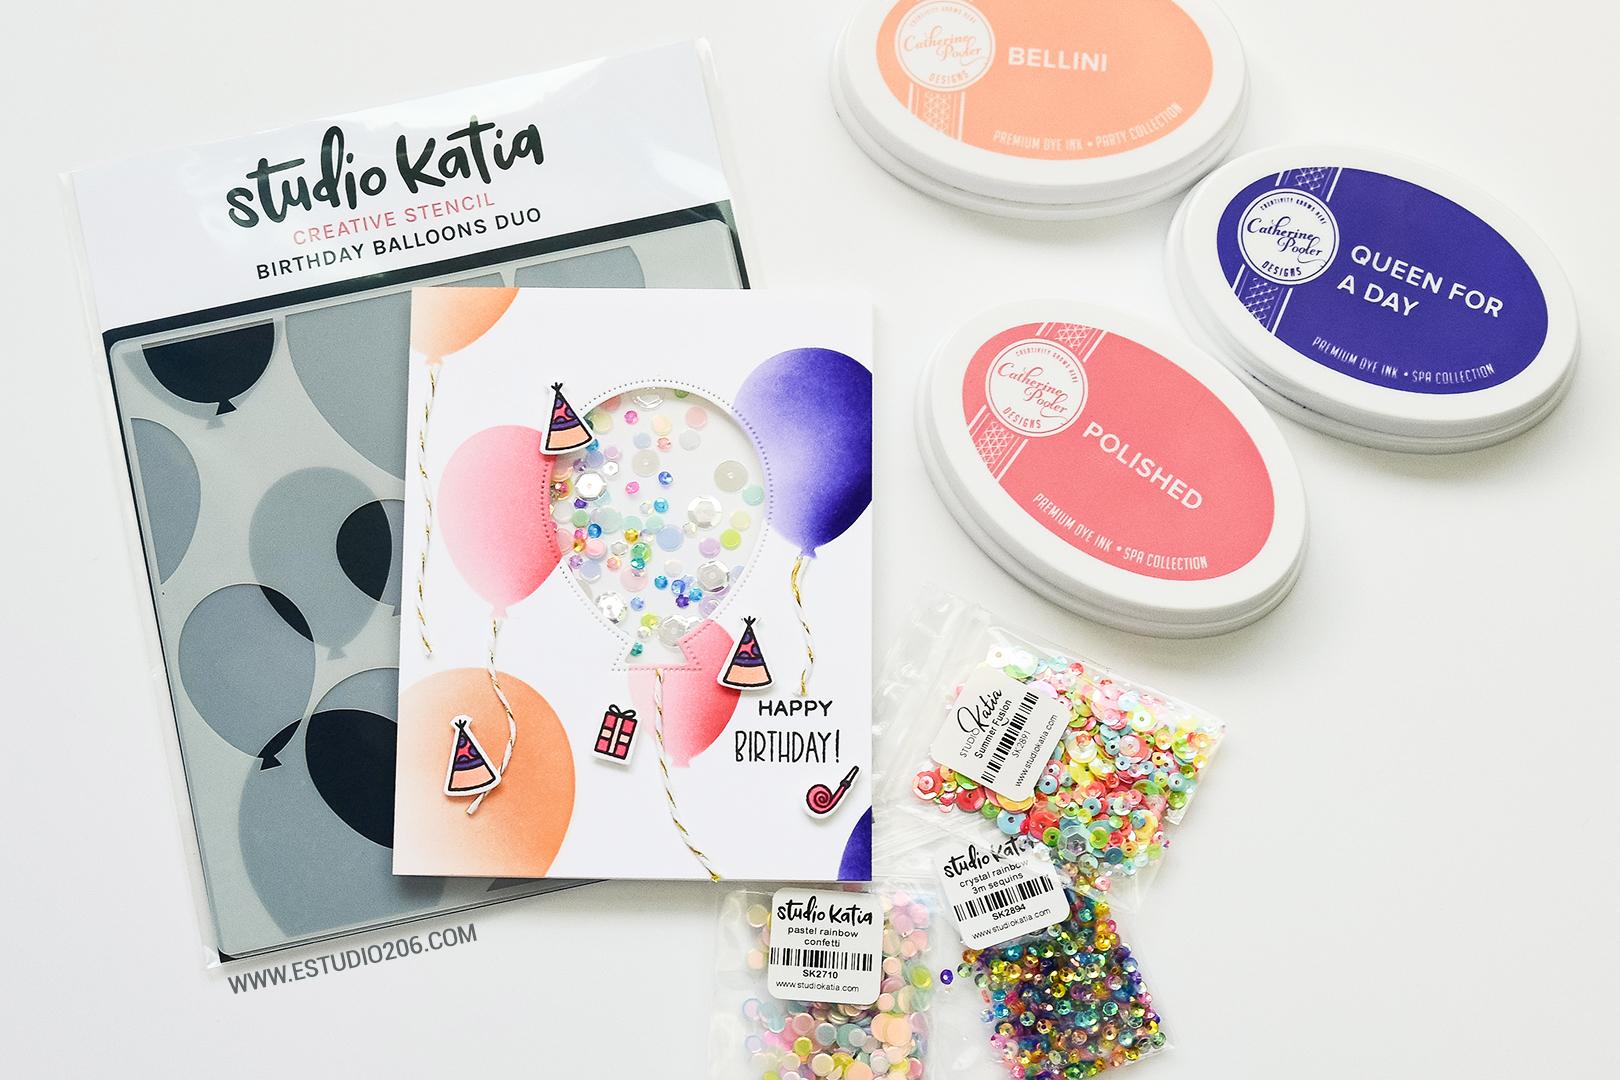 studio-katia-adelina02.jpg